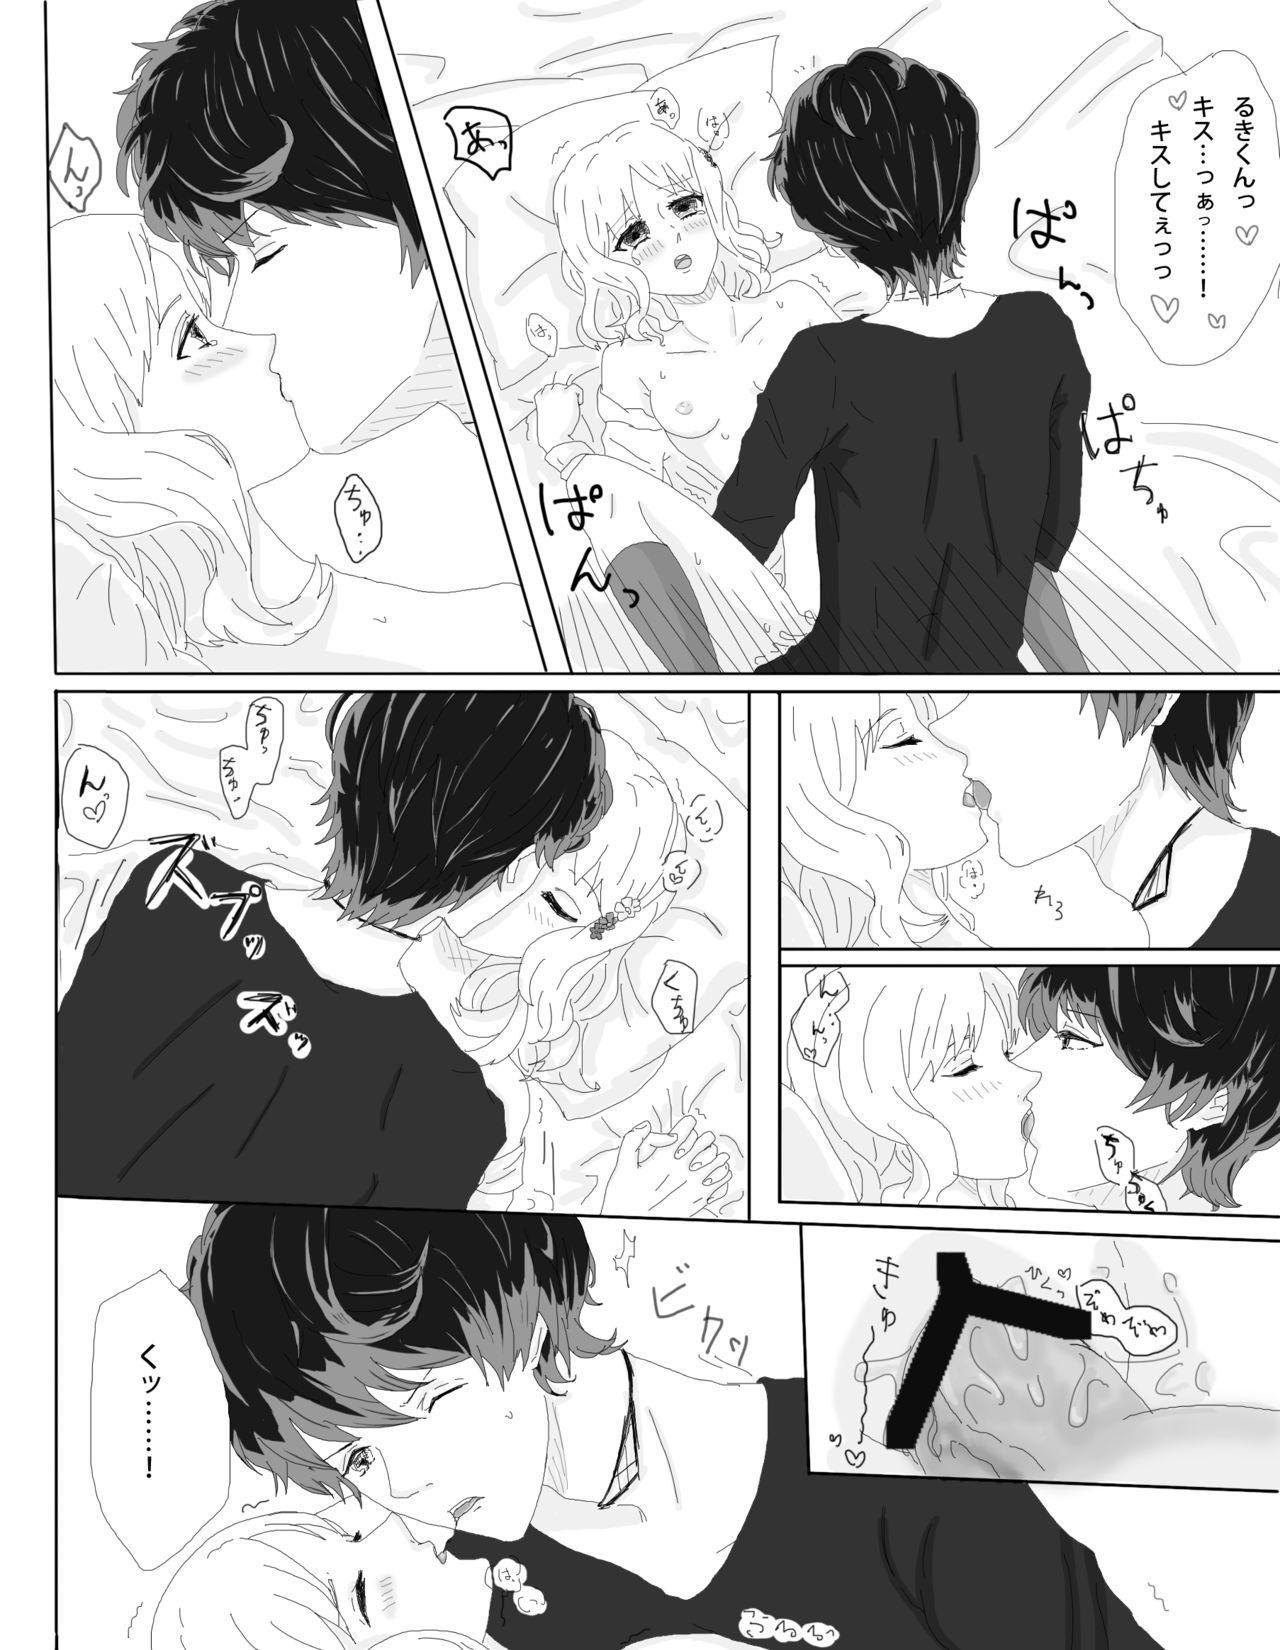 Rukiyui-chan no wo Midarana Manga 2